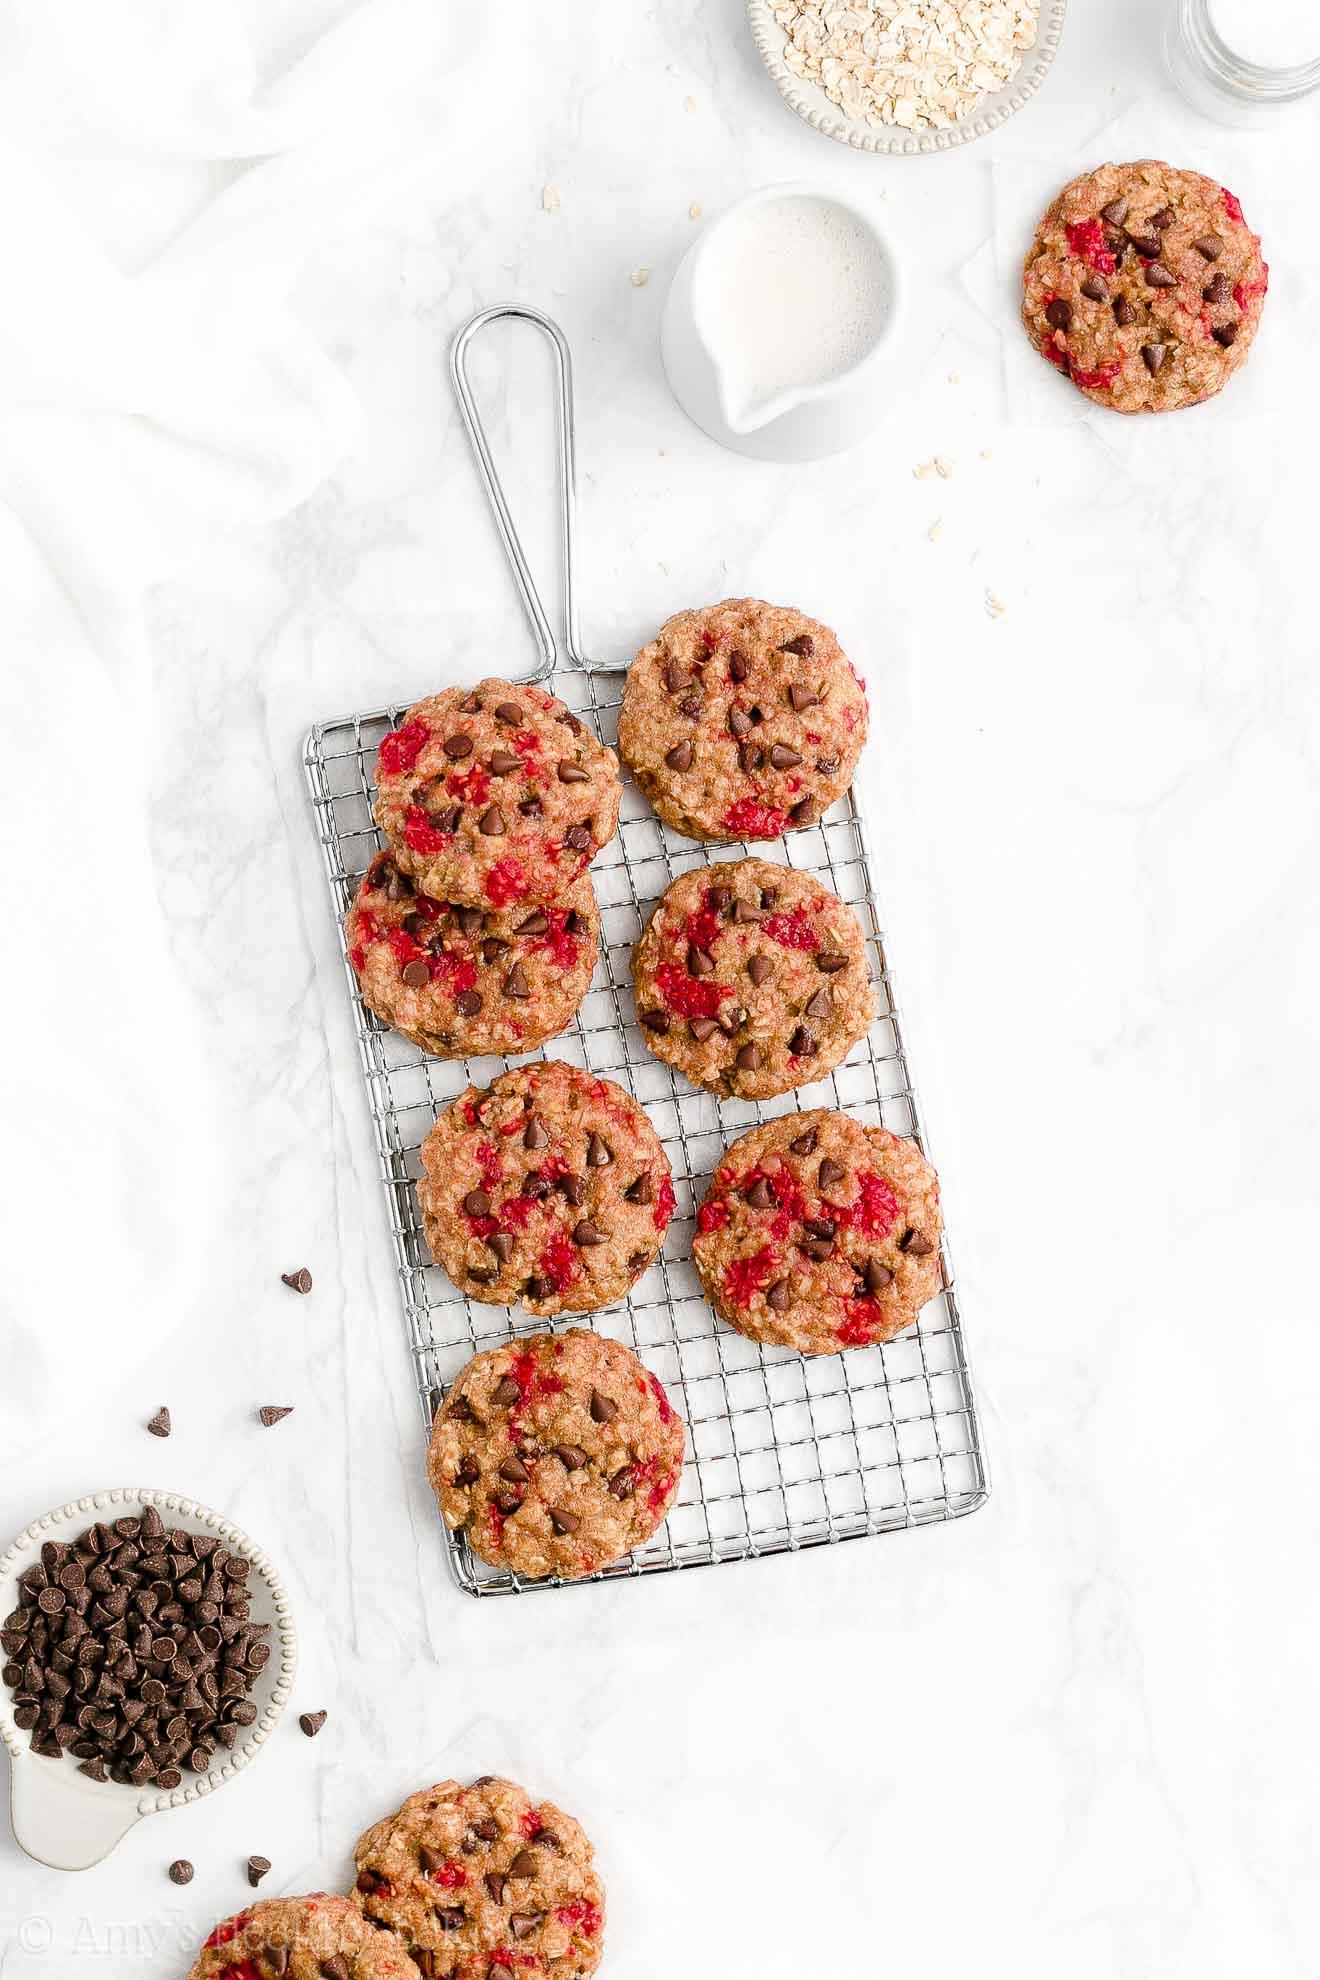 Easy Healthy Gluten Free Raspberry Chocolate Chip Oatmeal Breakfast Cookies